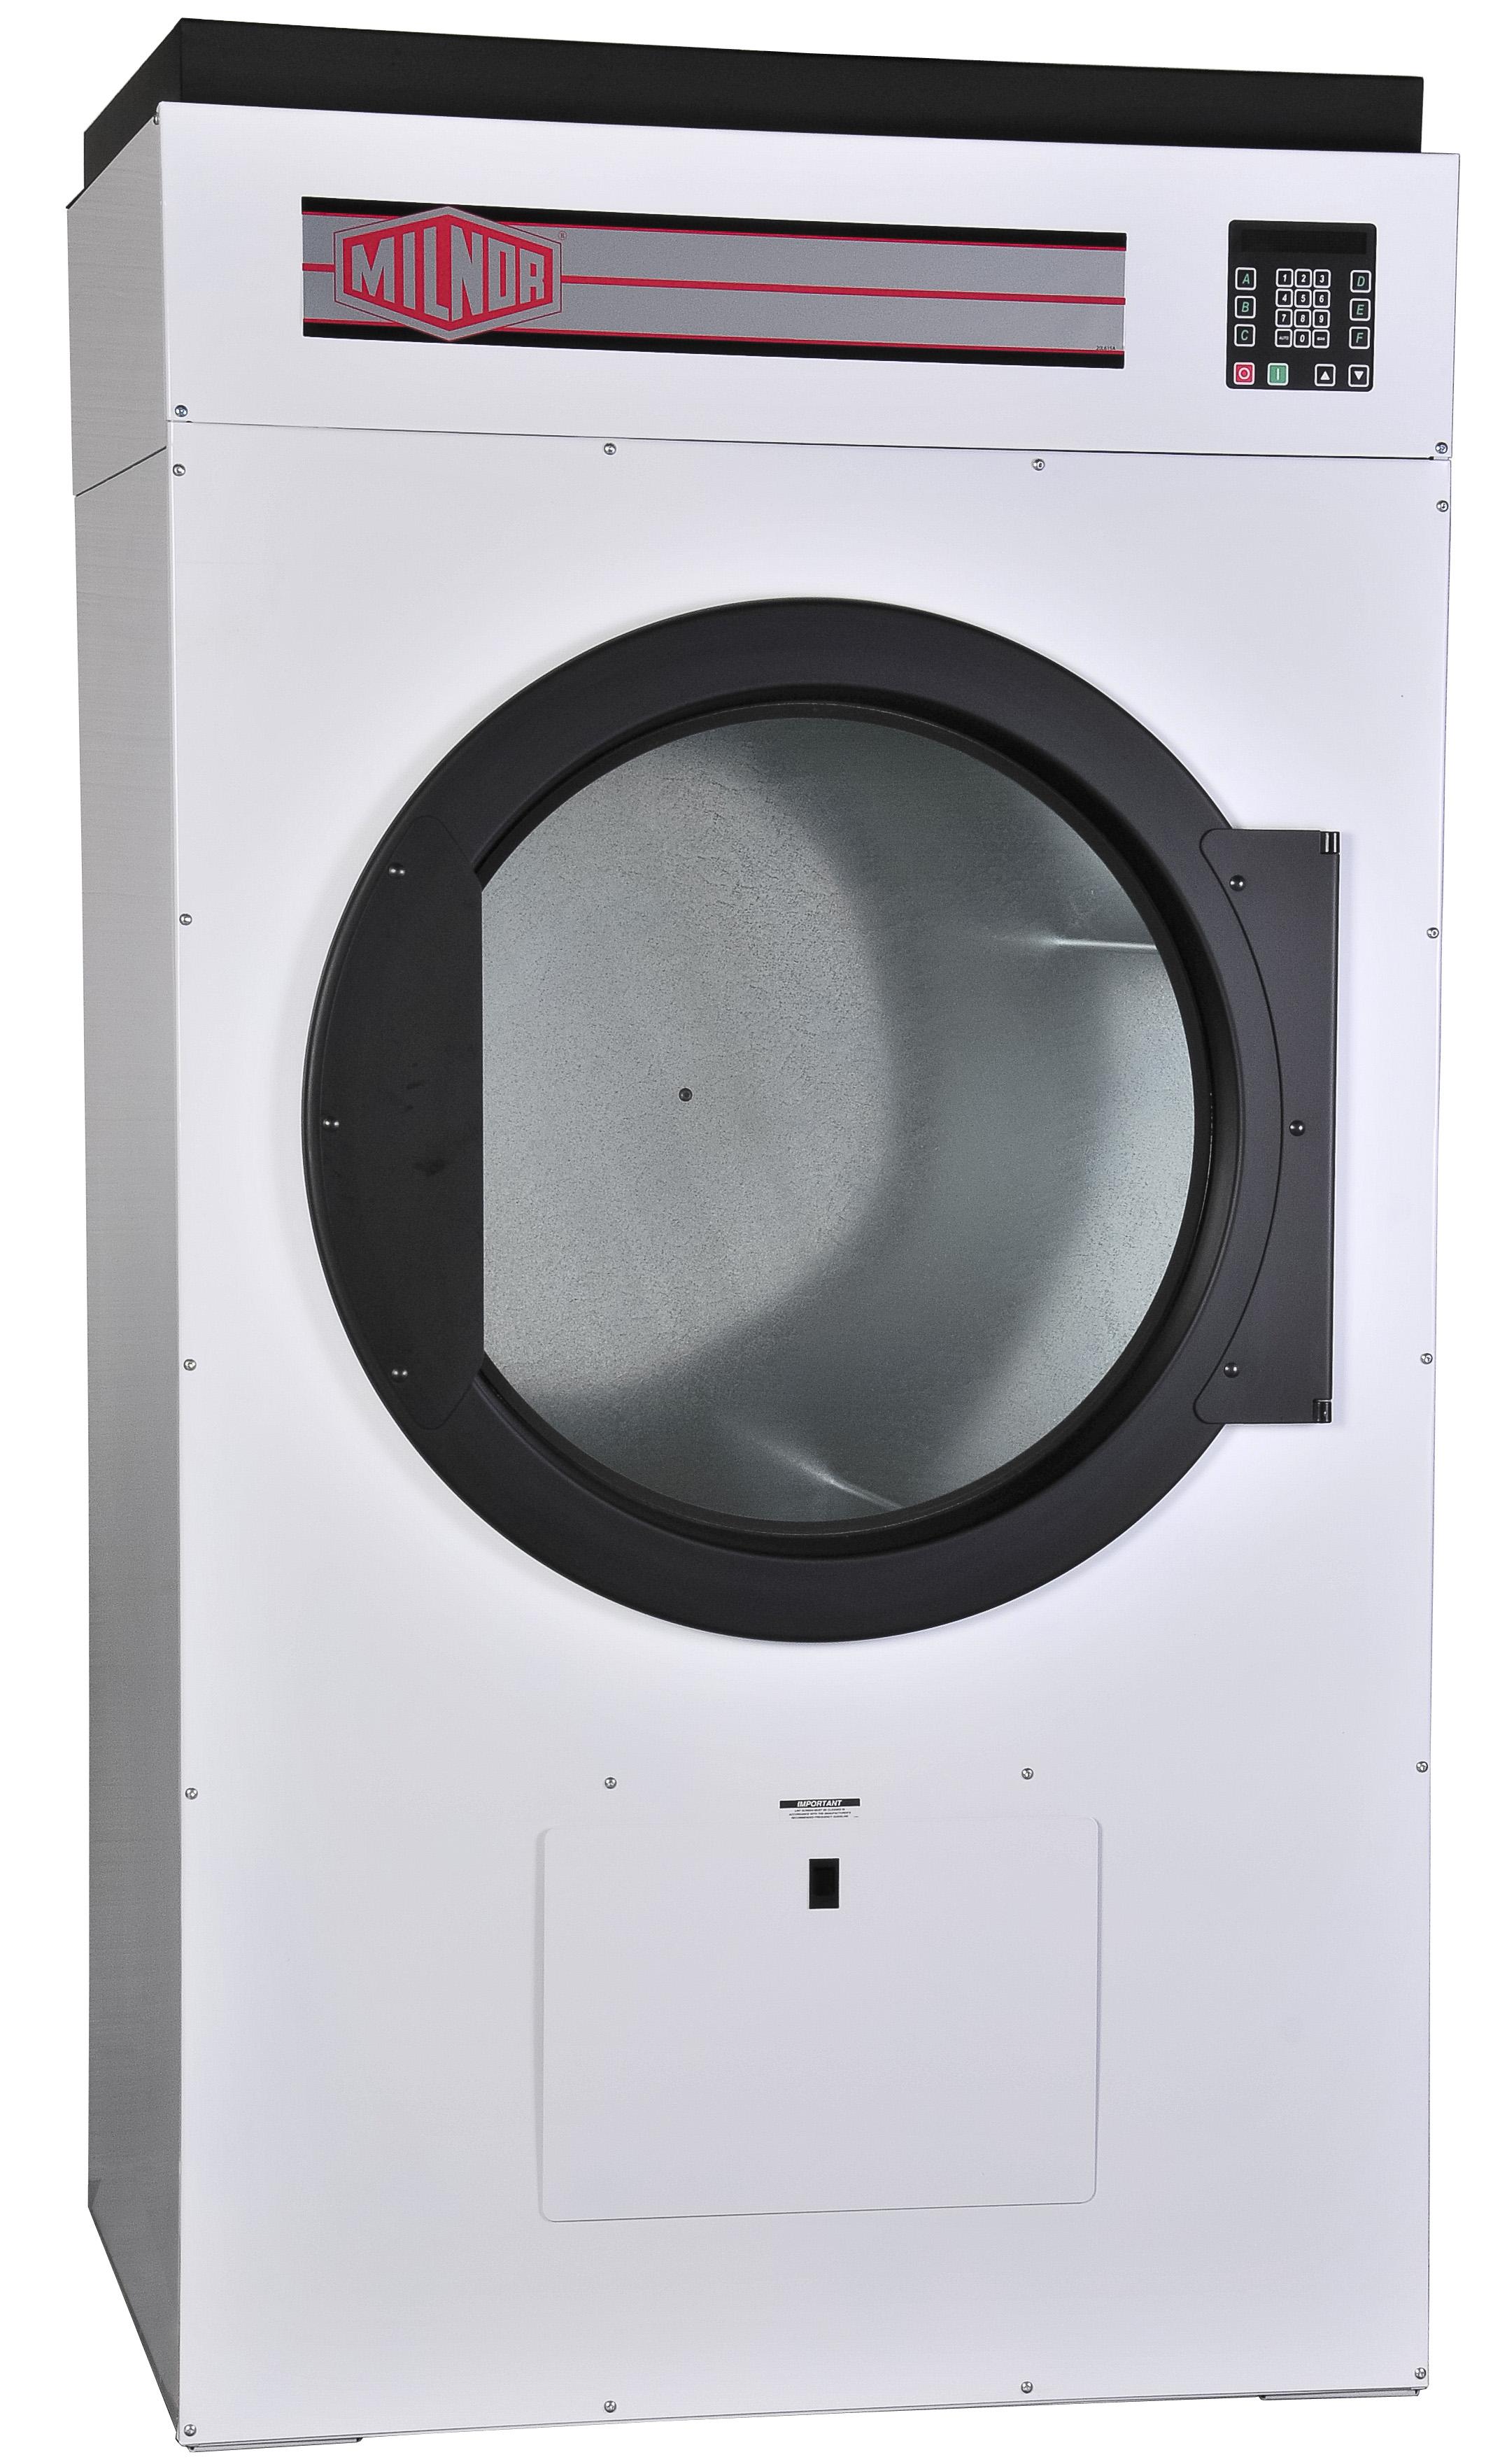 m78 pellerin milnor corporation rh milnor com Samsung Dryer Wiring Diagram Electric Dryer Wiring